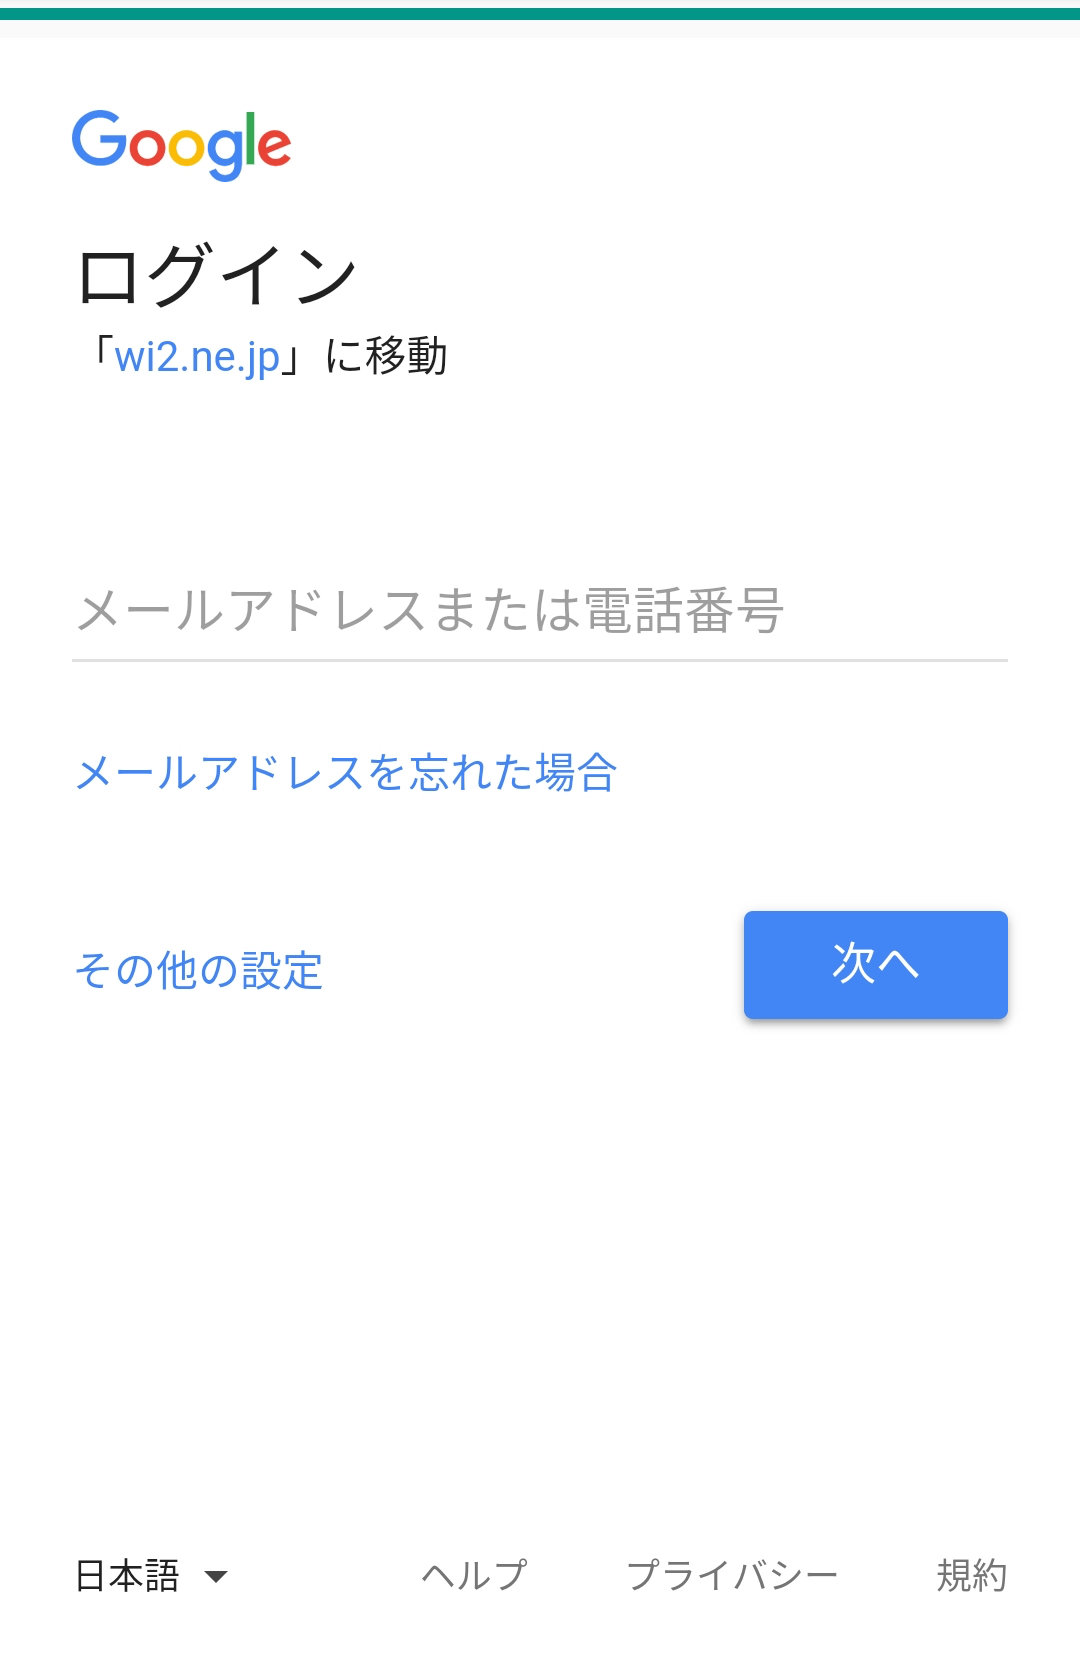 GoogleでKYOTO Wi-Fiを利用する画面